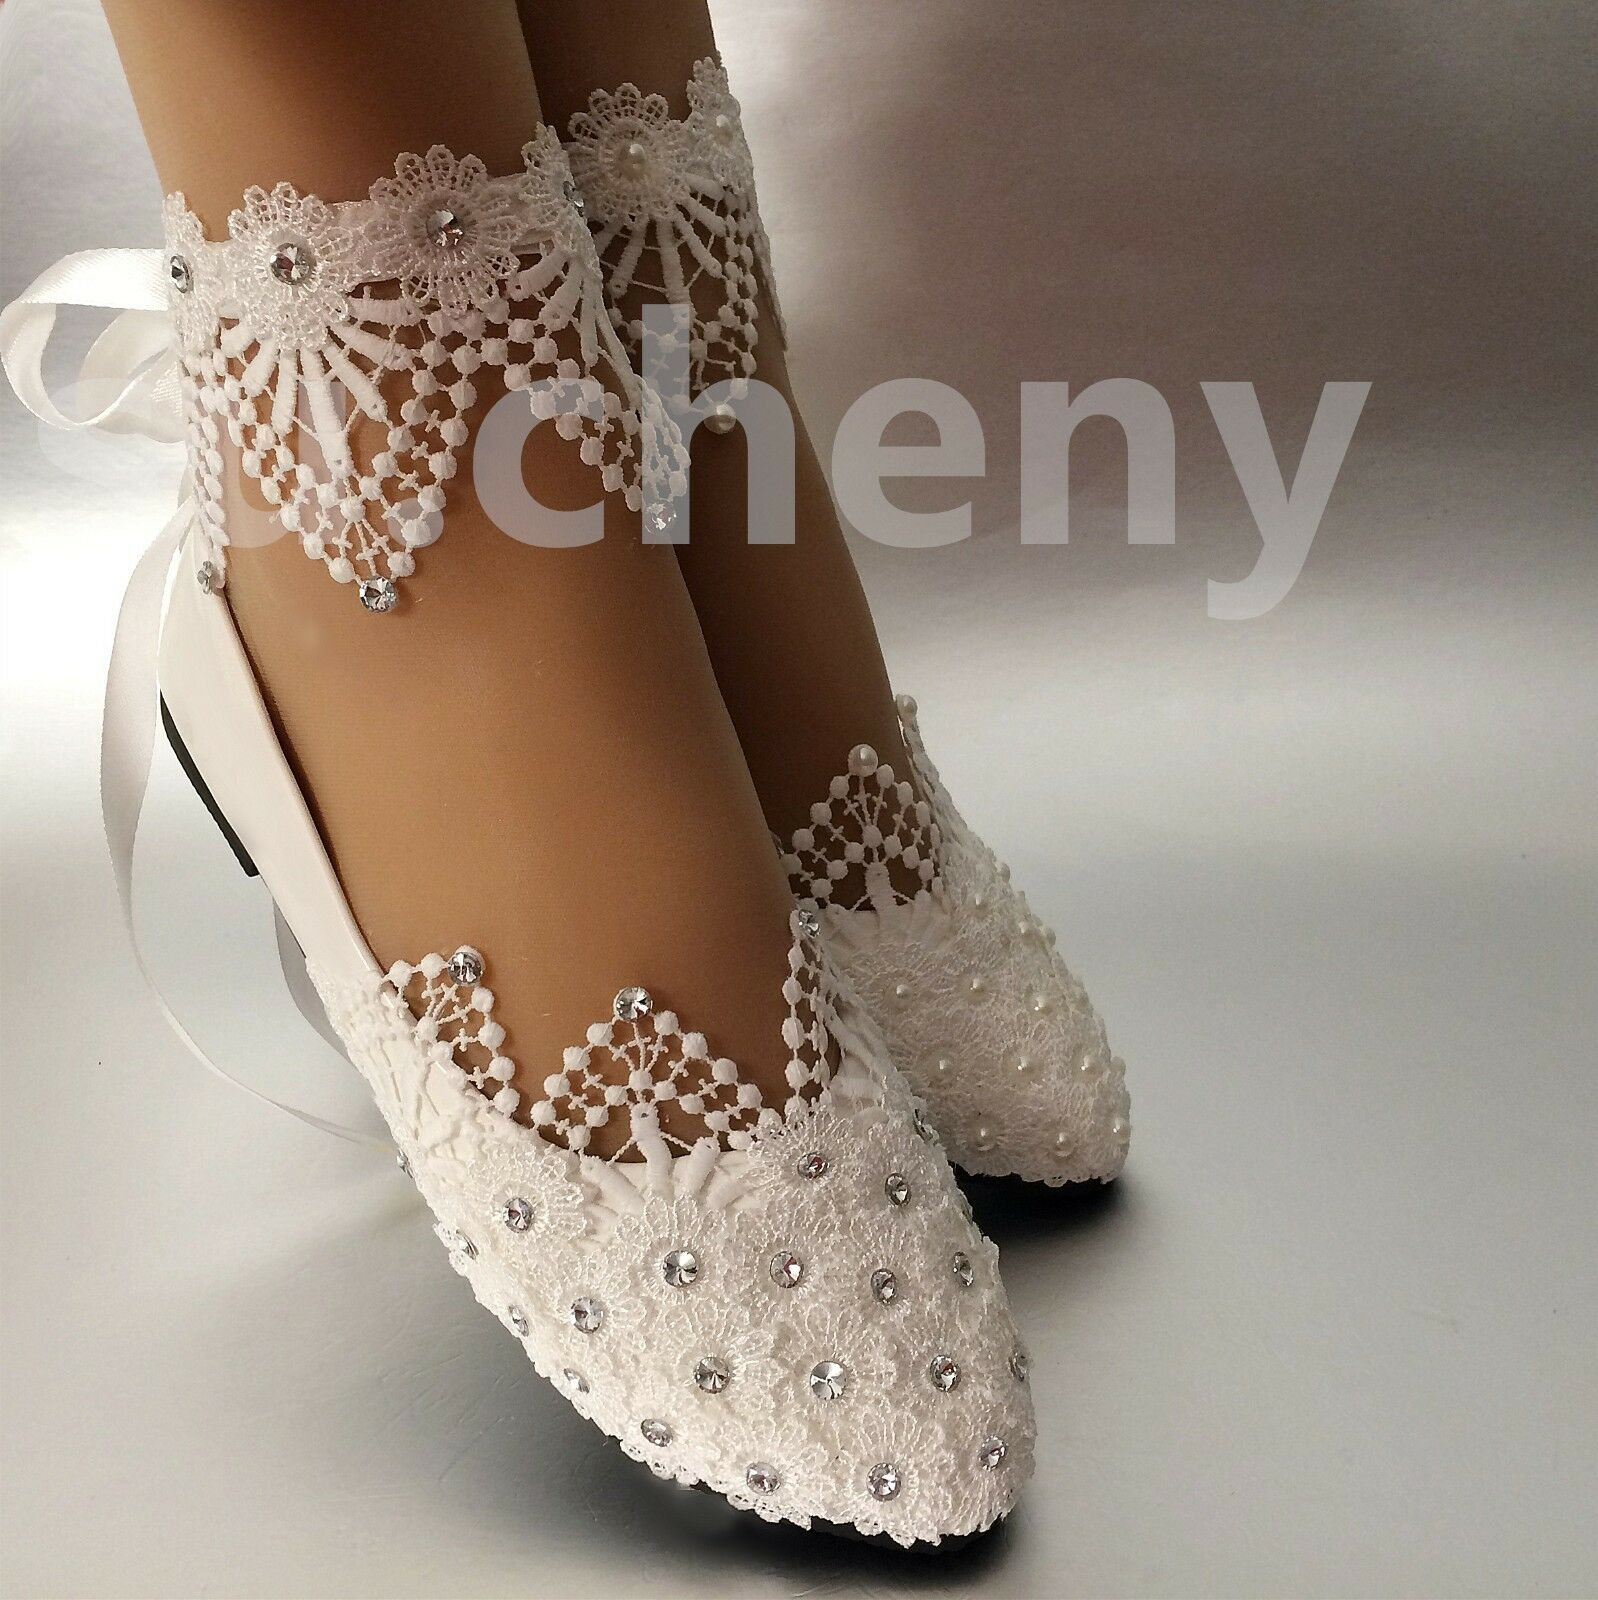 3fff6794afa su.cheny White light ivory lace pearl rhinestone ankle flat Wedding Bridal  shoes